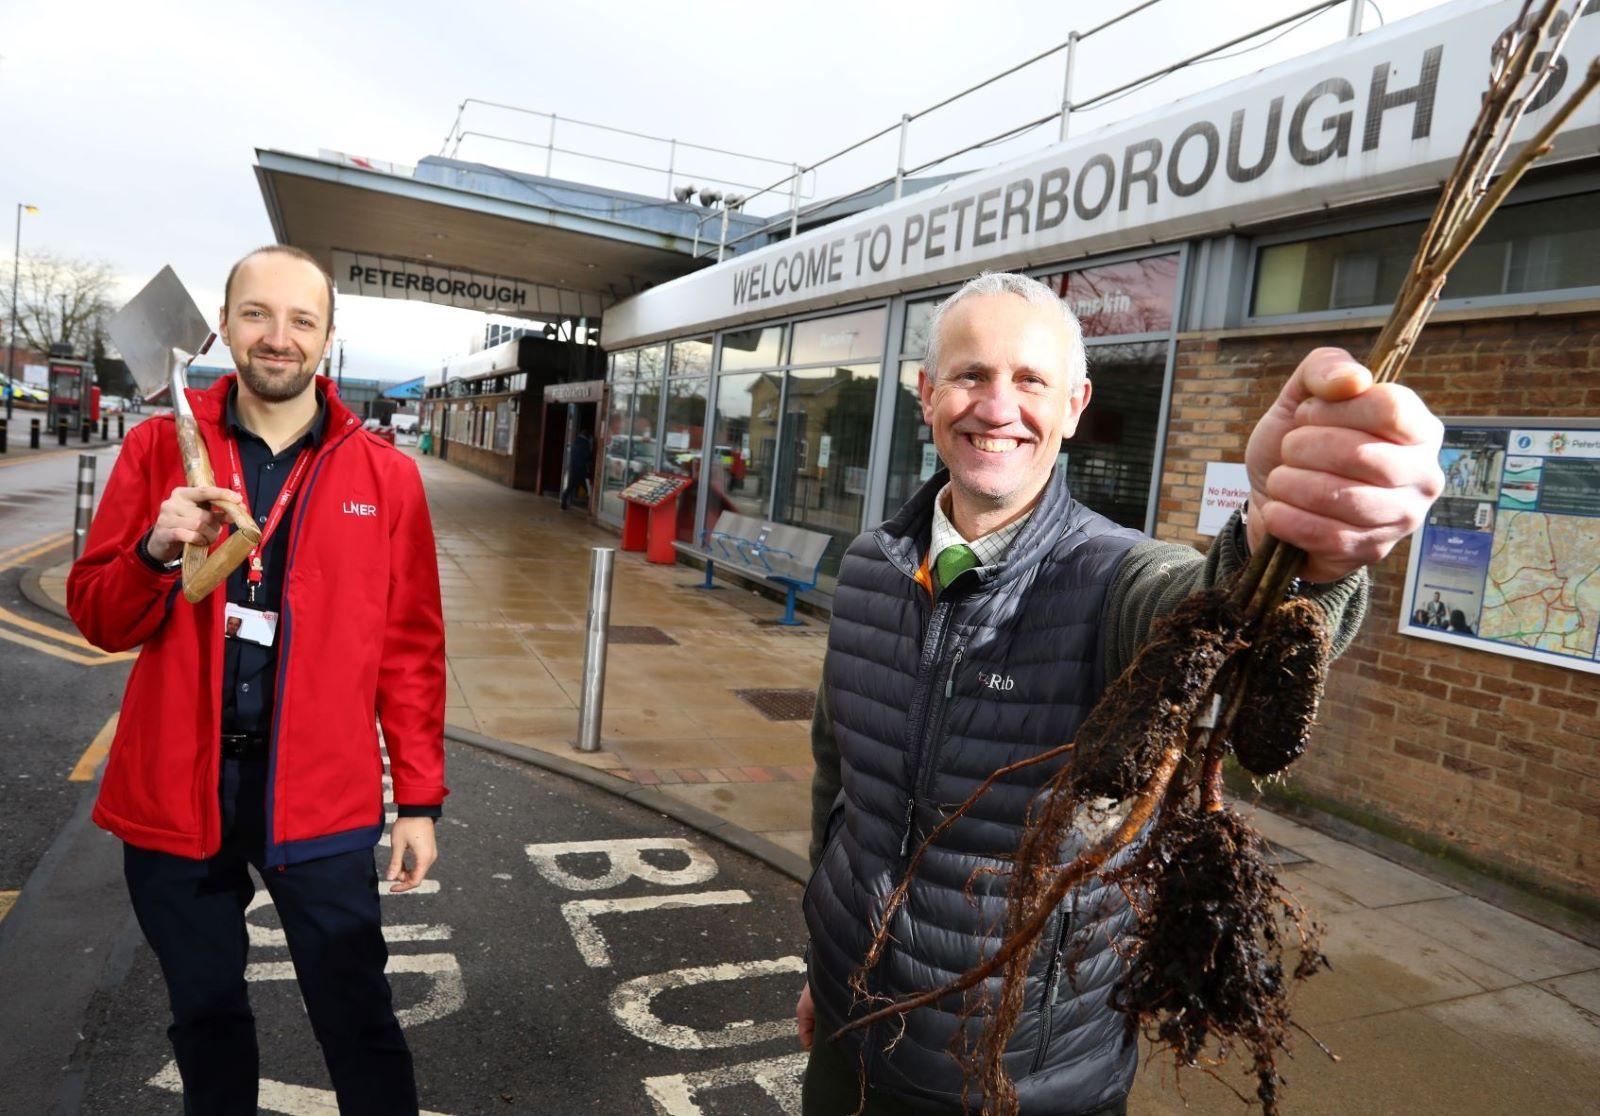 5,000 Trees Planted Across Peterborough As LNER Partnership Takes Root